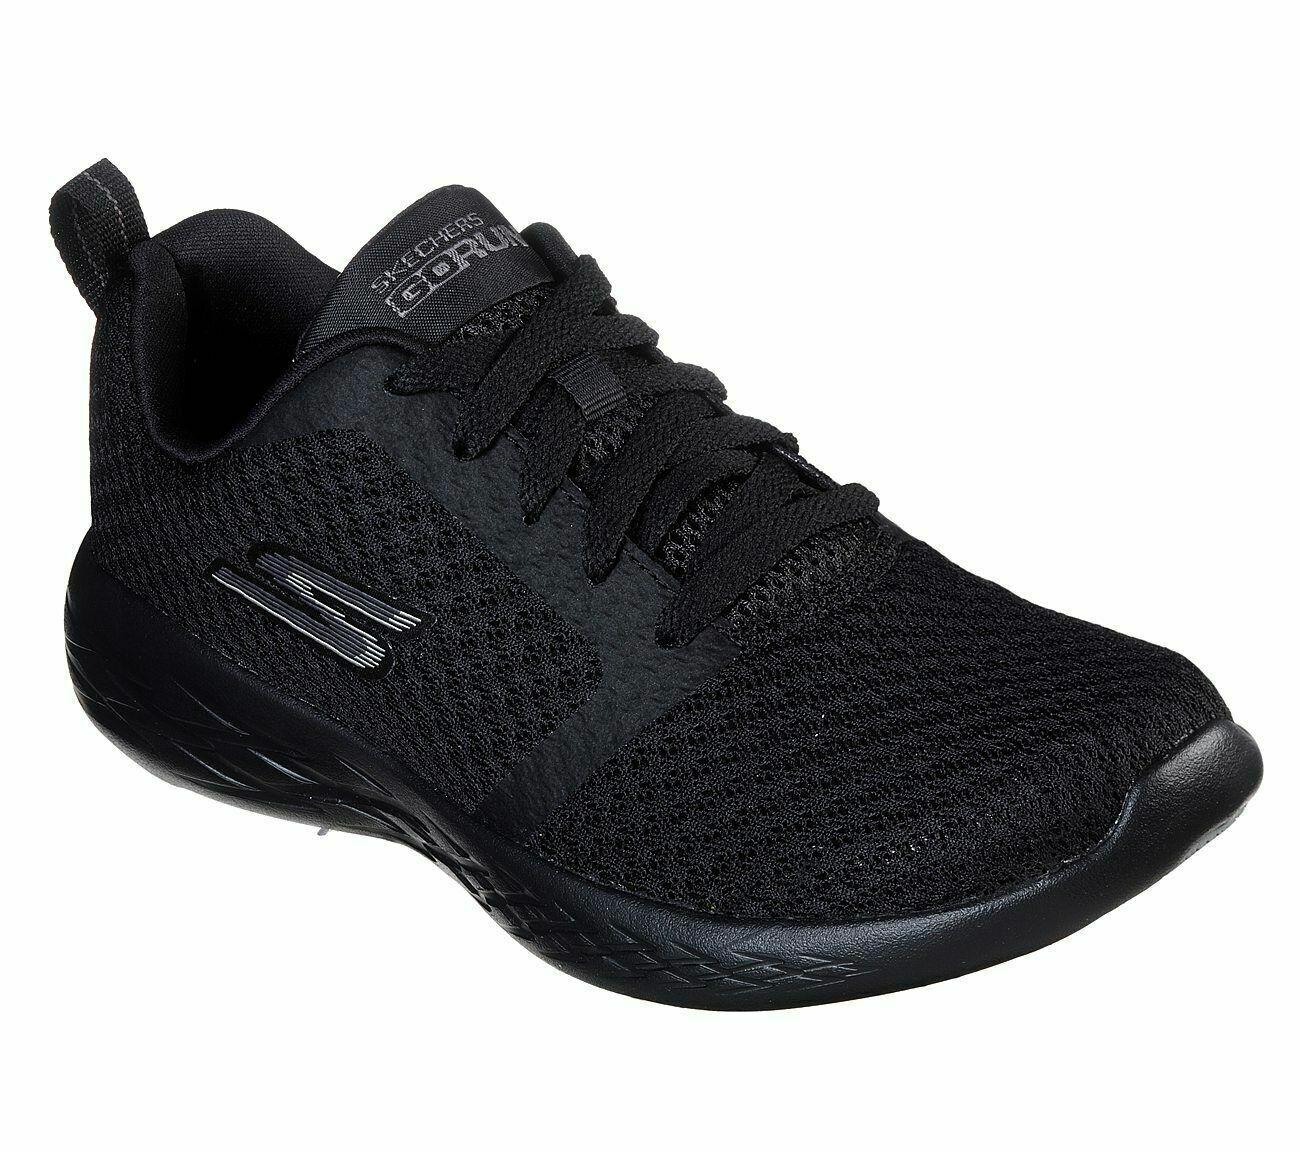 Shoes Women's Skechers Black Sport Go Run 600 Mesh Athletic Casual 15098 Running